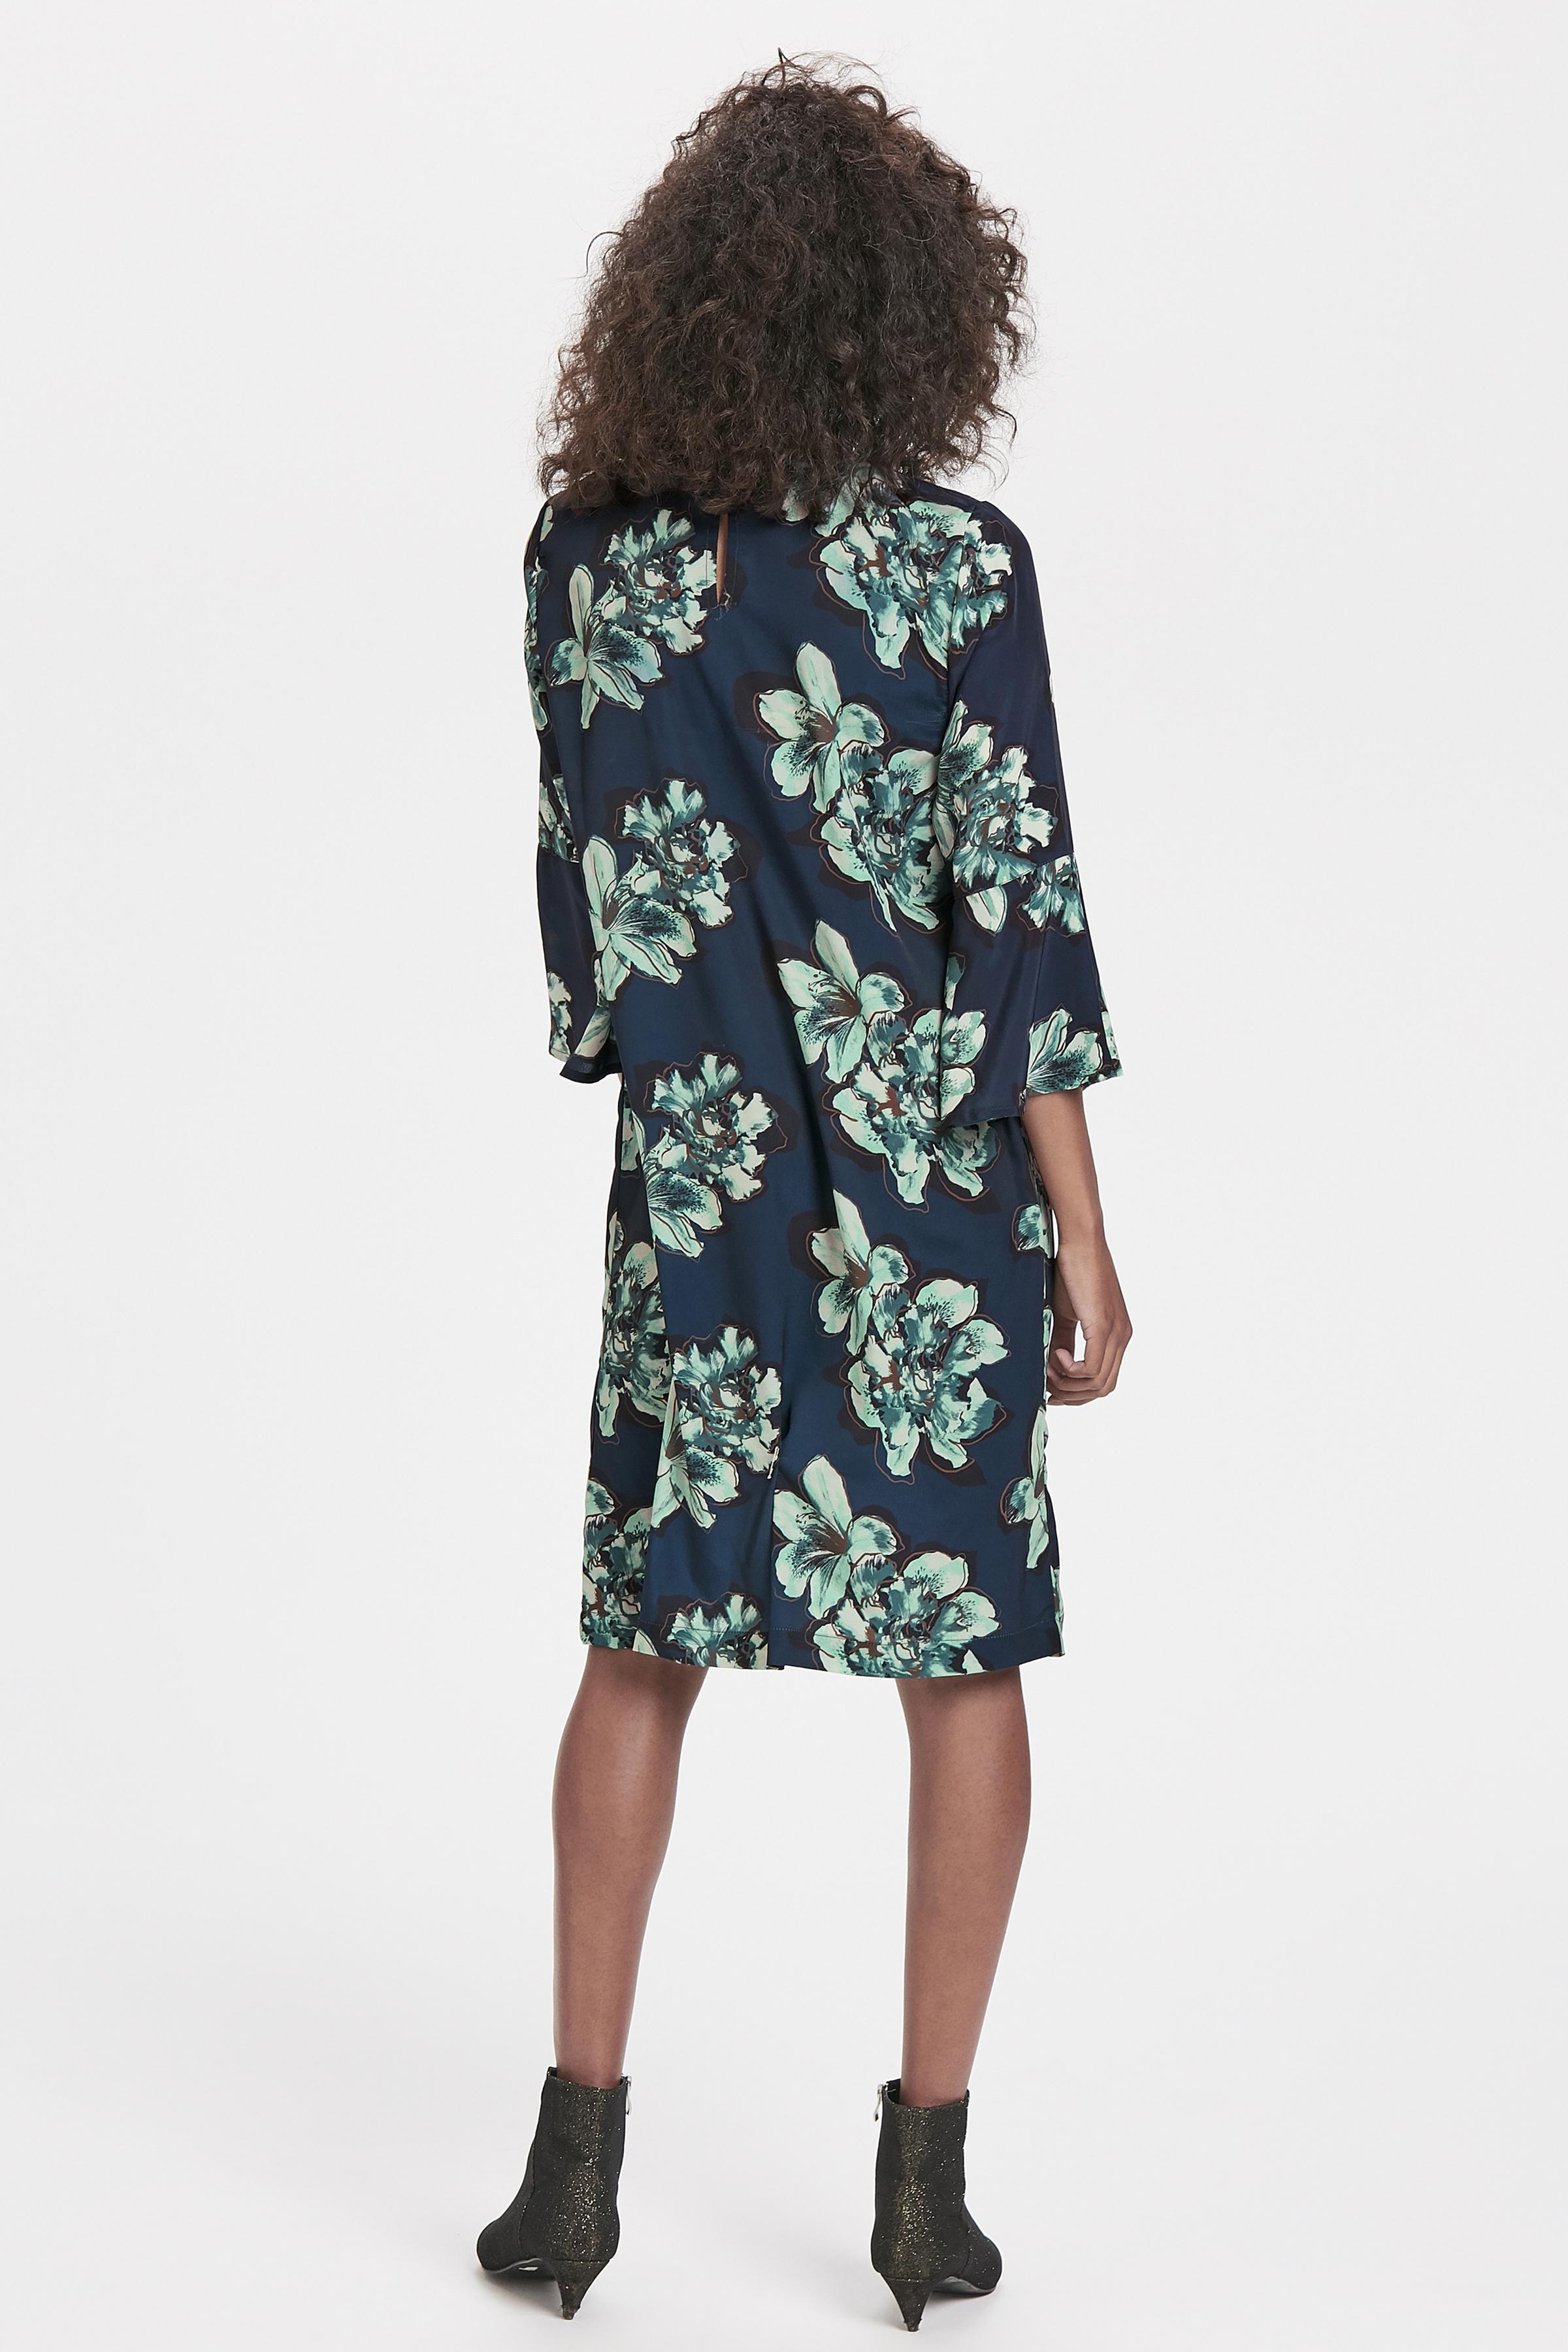 Marineblau/grün Kleid von Bon'A Parte – Shoppen Sie Marineblau/grün Kleid ab Gr. S-2XL hier